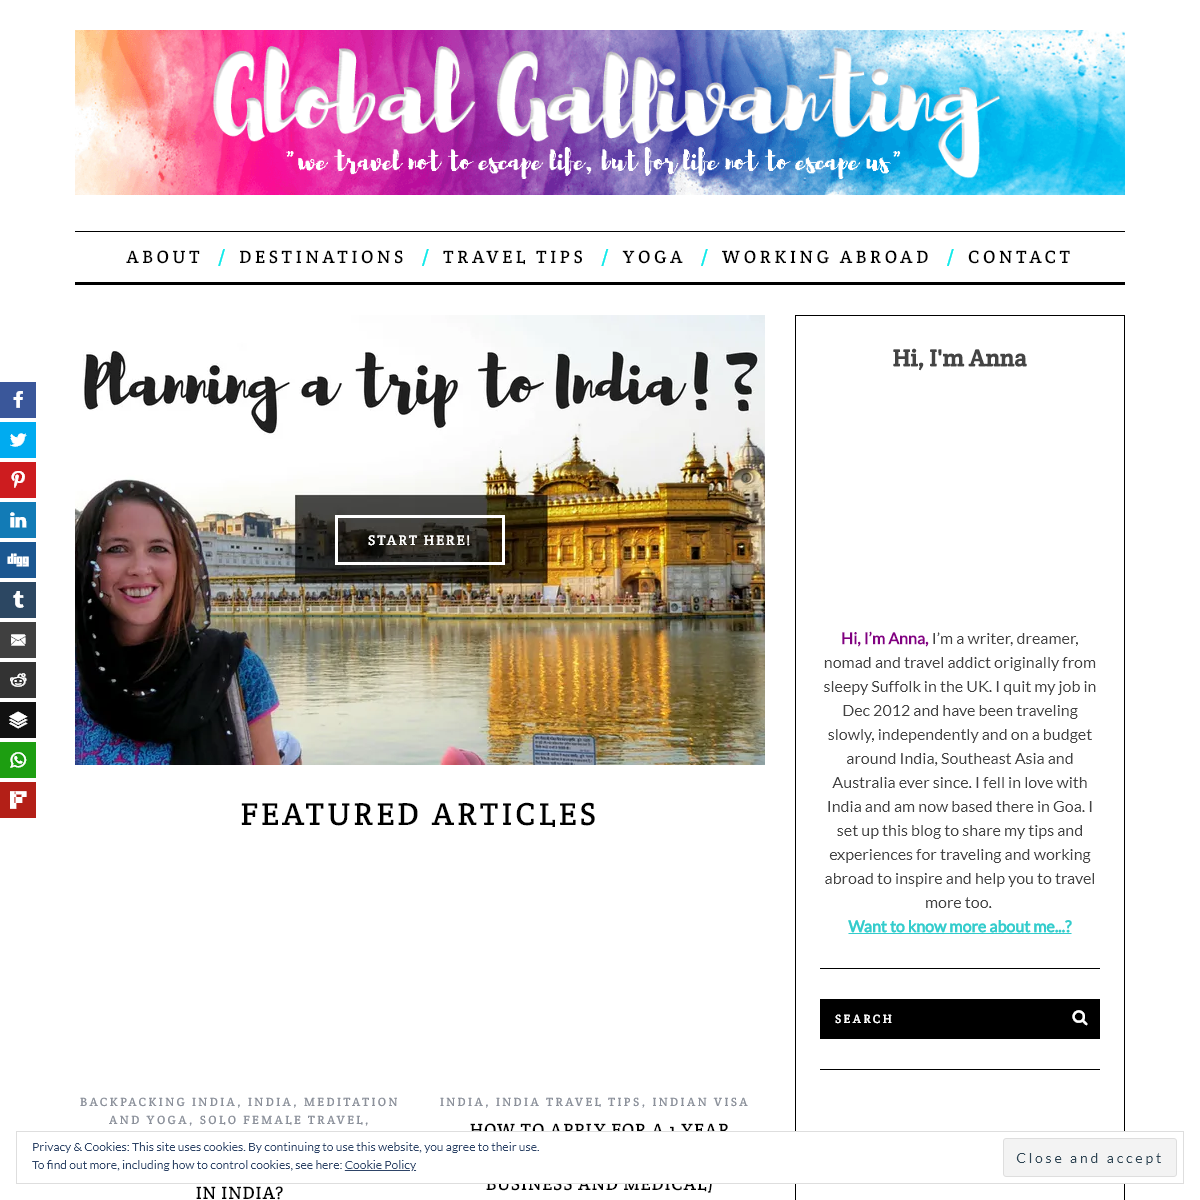 Global Gallivanting Travel Blog - Global Gallivanting Travel Blog